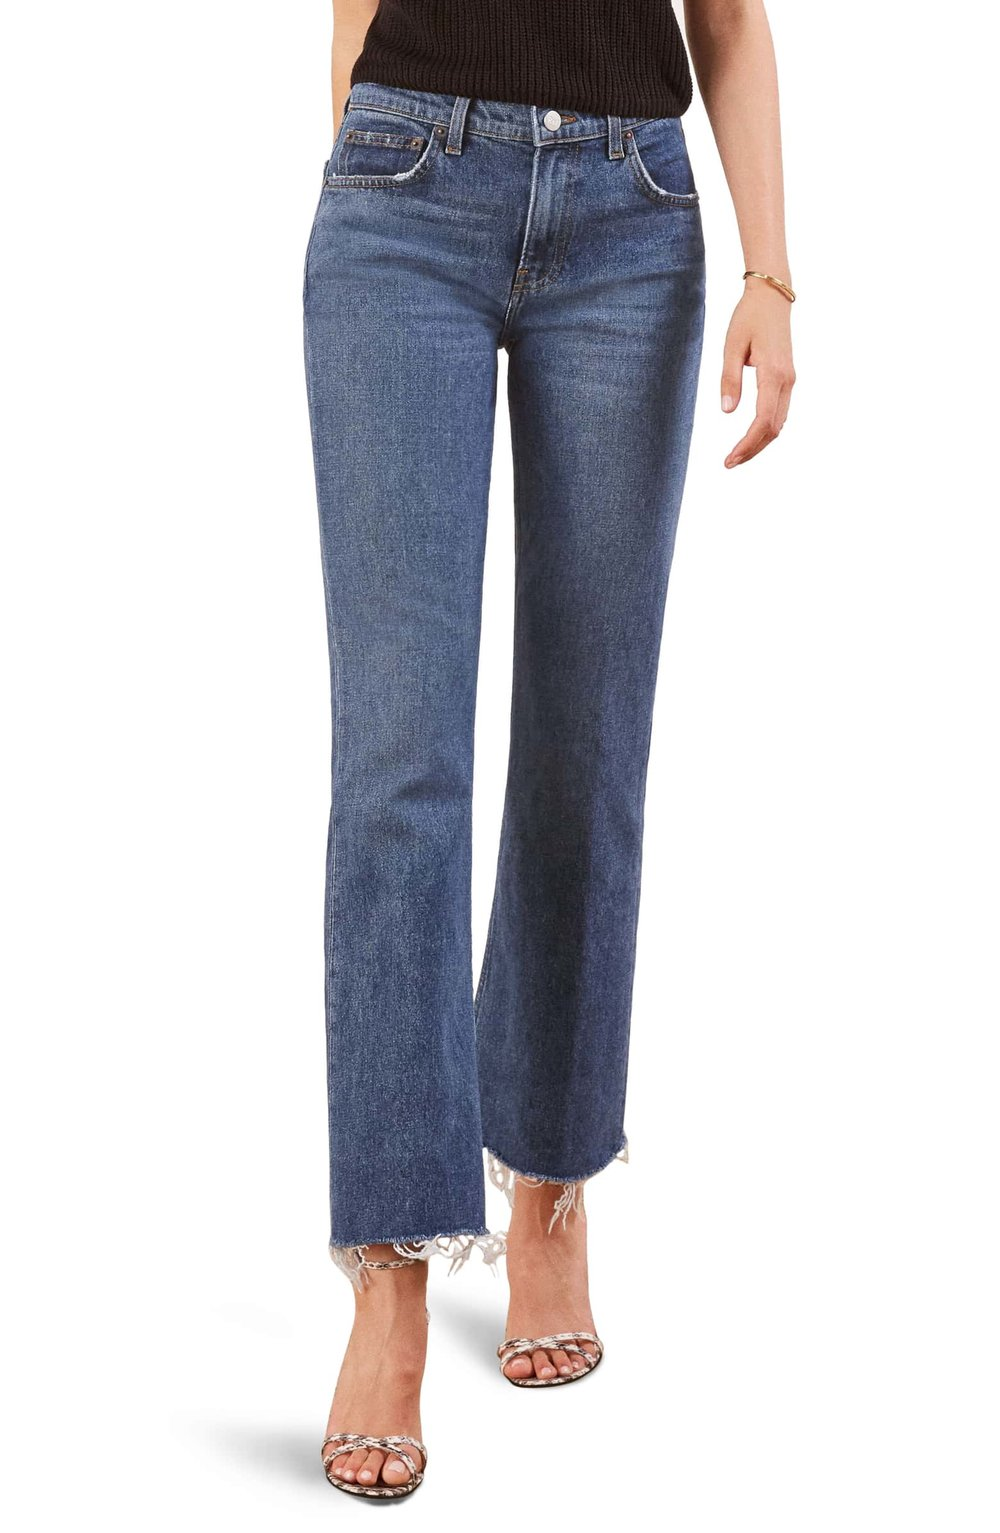 Reformation Crop Jeans